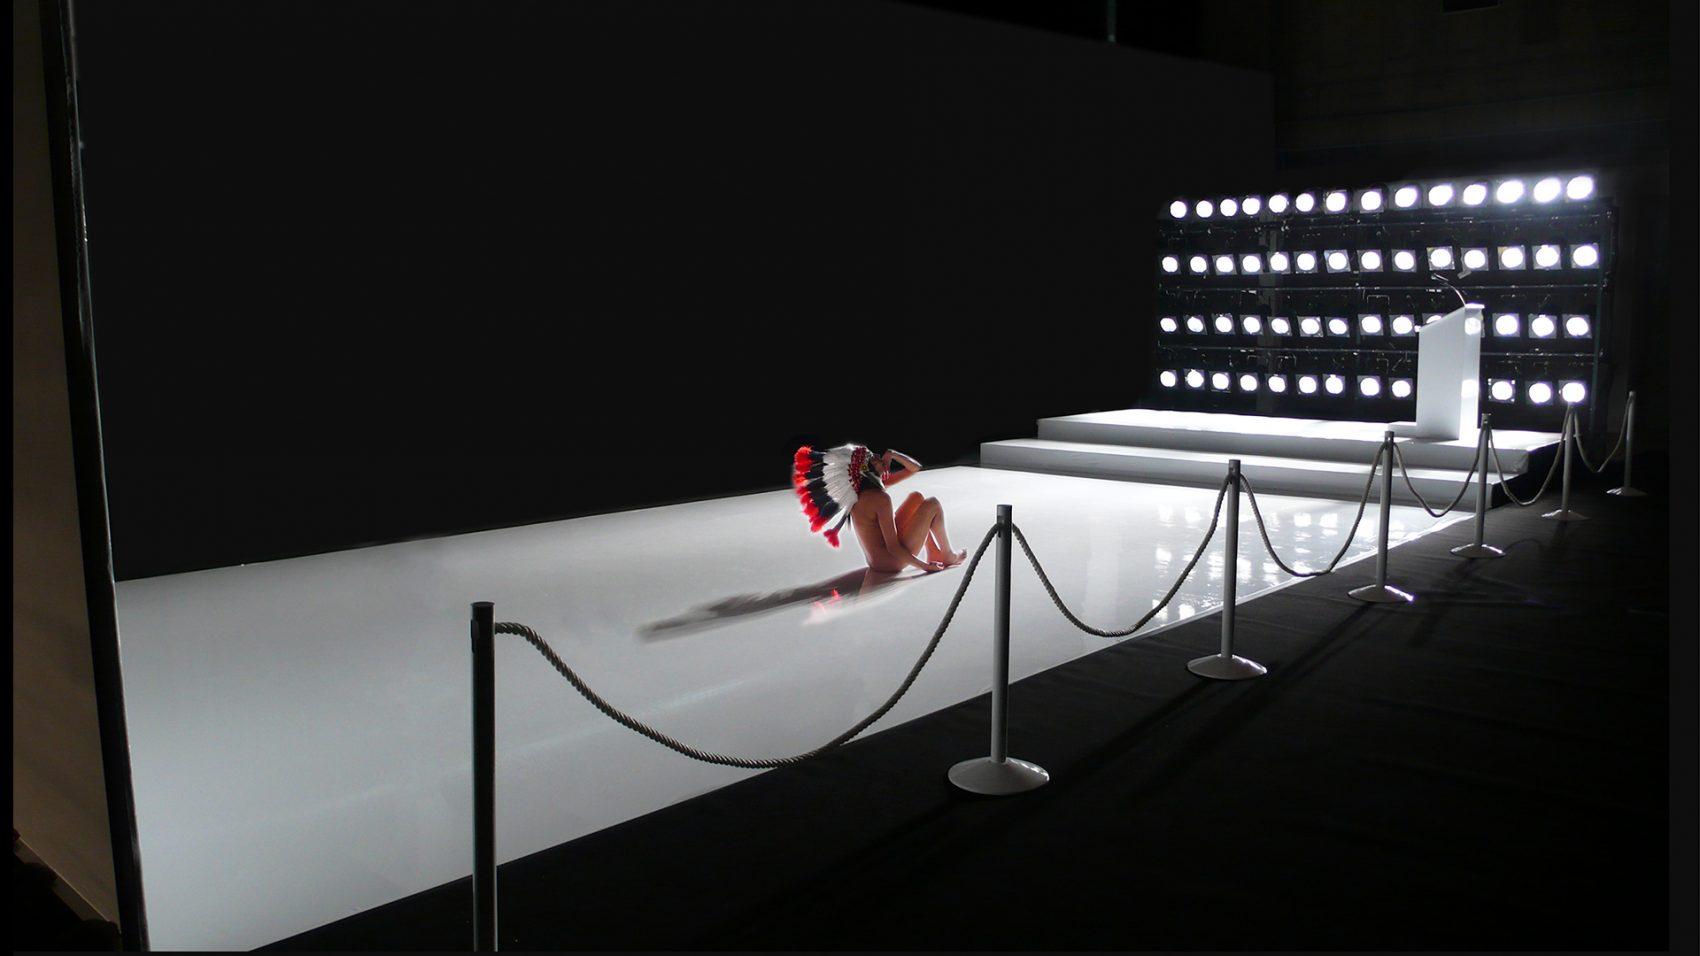 Nadia Lauro – Peau Blanche - Peau Blanche 2006